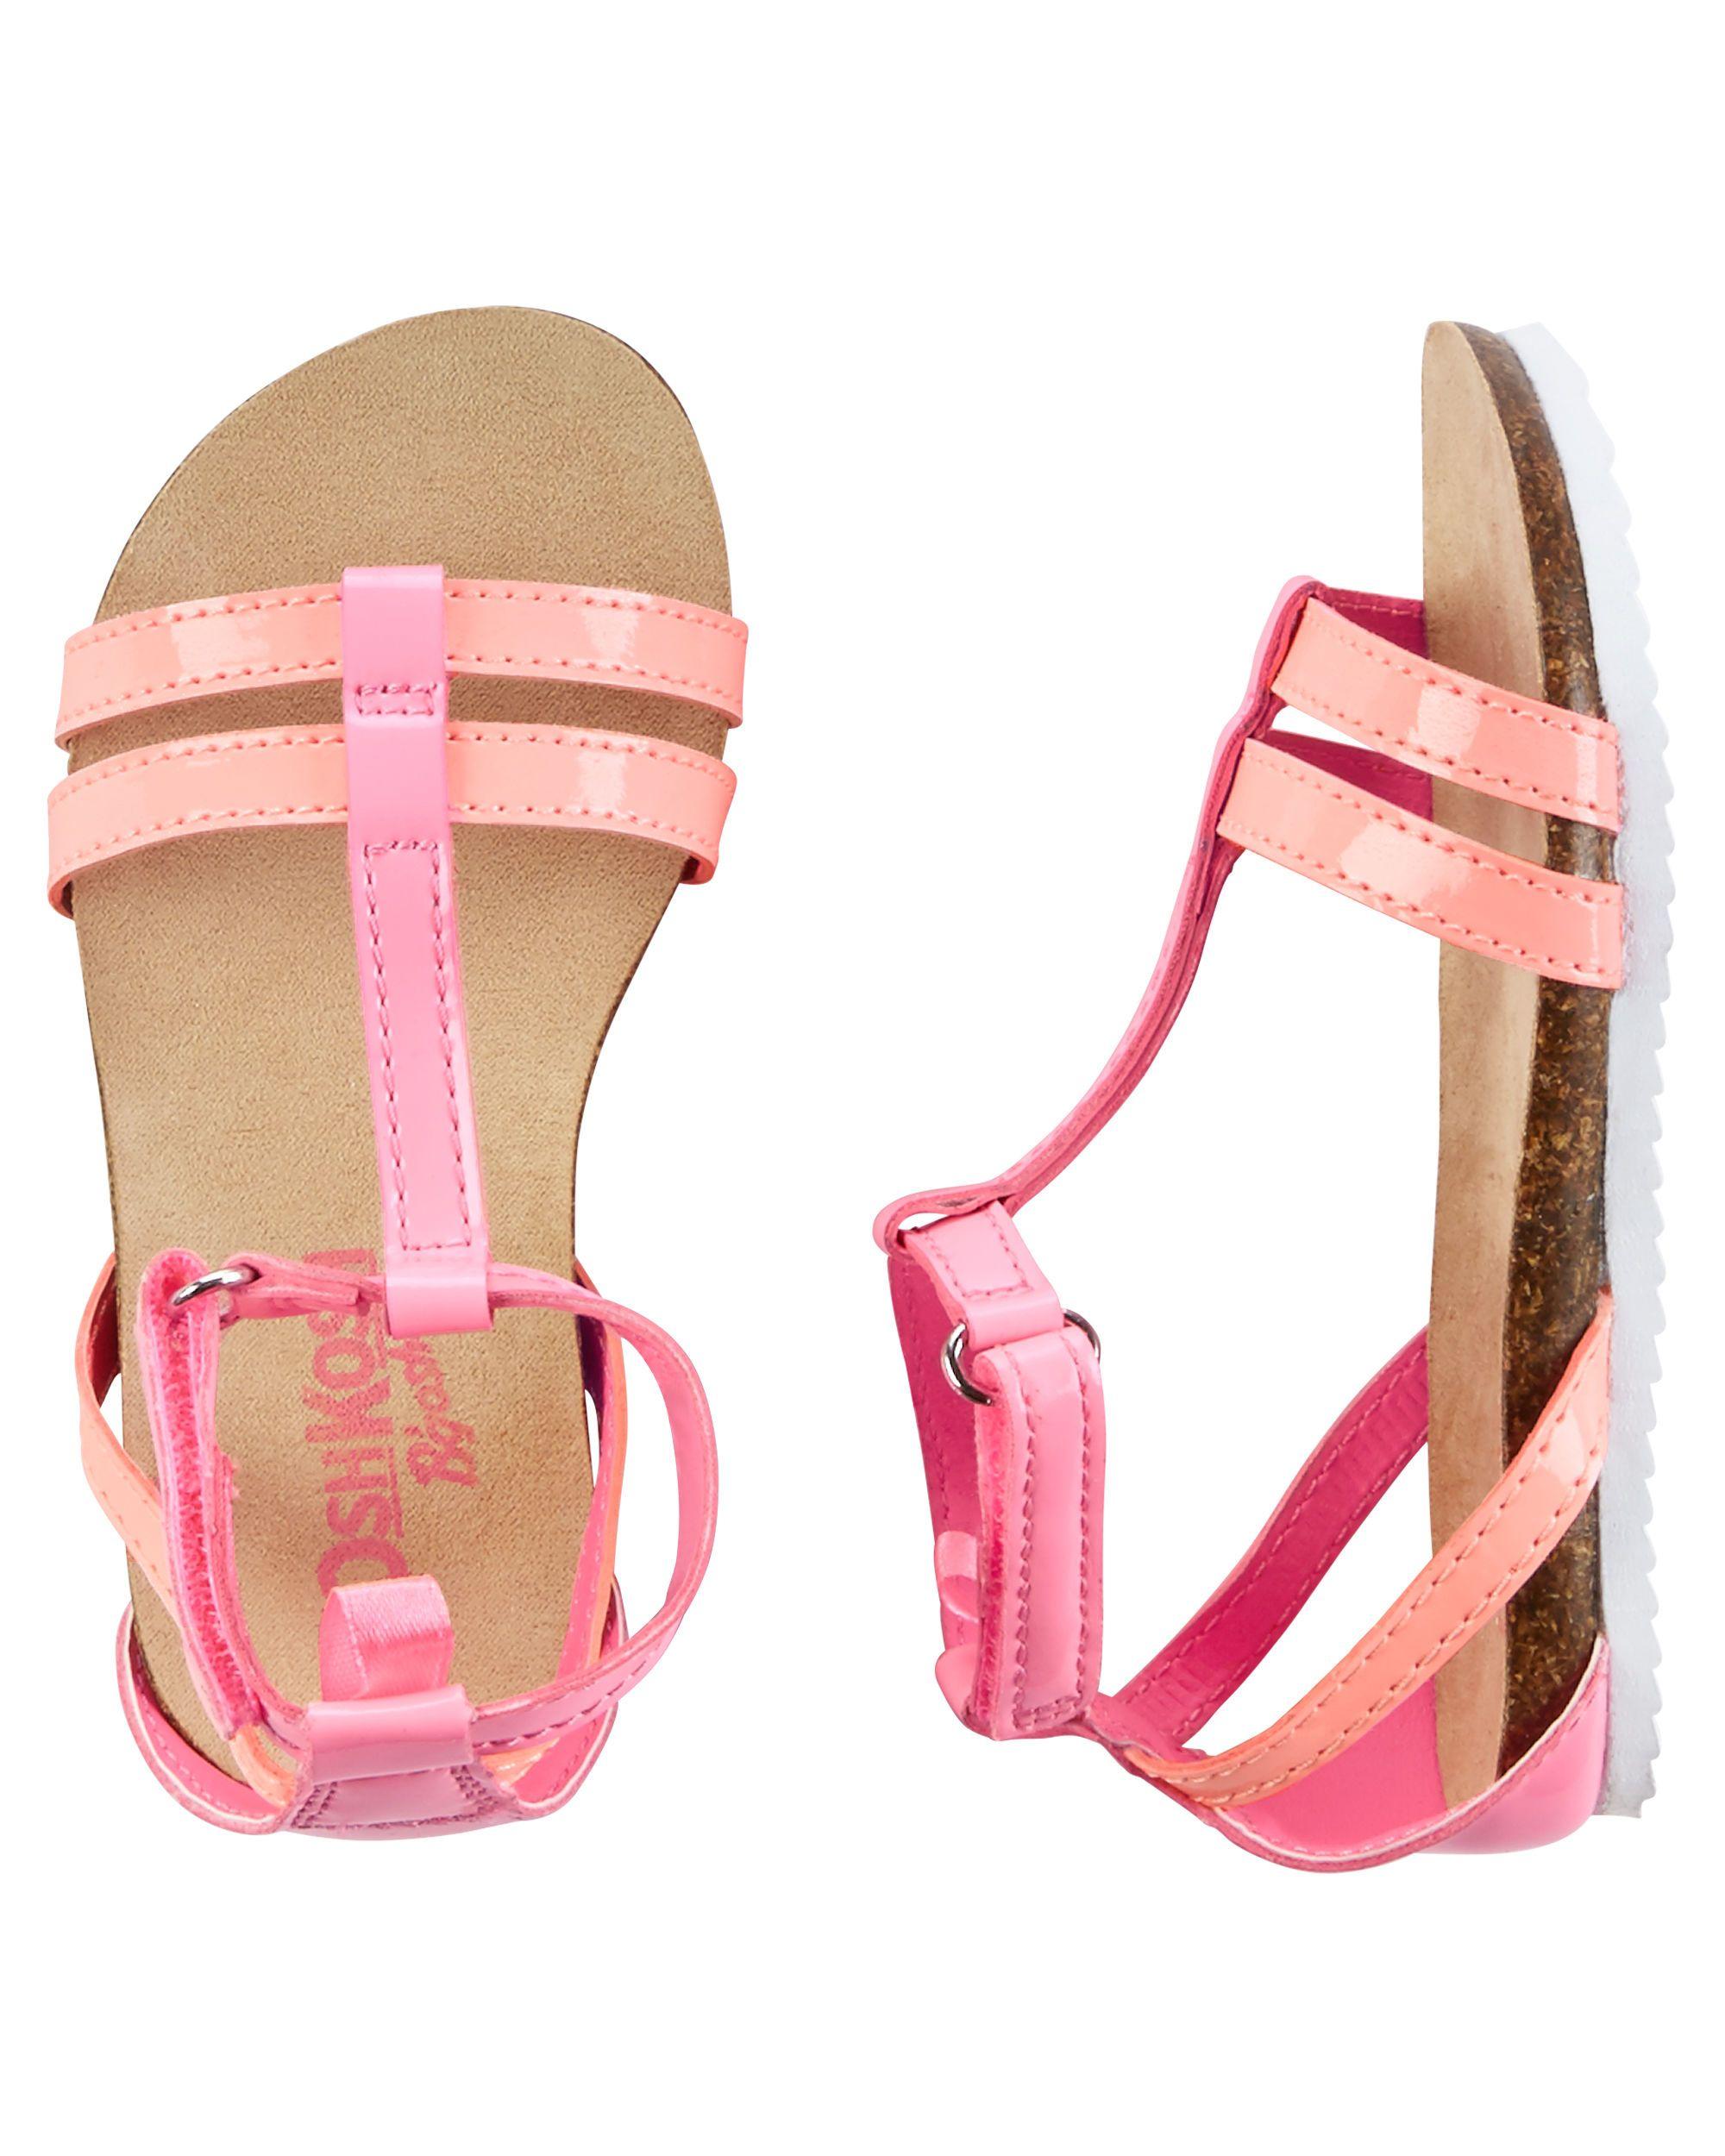 OshKosh T-Strap Sandals | Babies, Baby girl stuff and Baby girl fashion